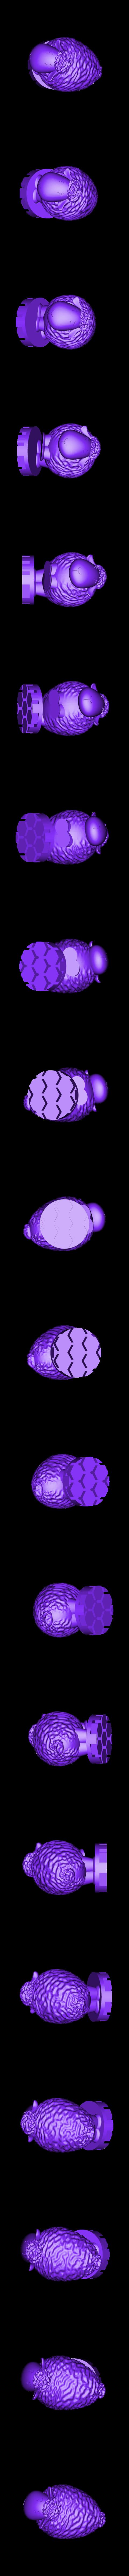 Zoetrope_Prusament Spool_by Dominik Cisar_Sheep 10.stl Download free STL file SPIROGRAPH - PRUSAMENT SPOOL - reuse idea • 3D print model, cisardom